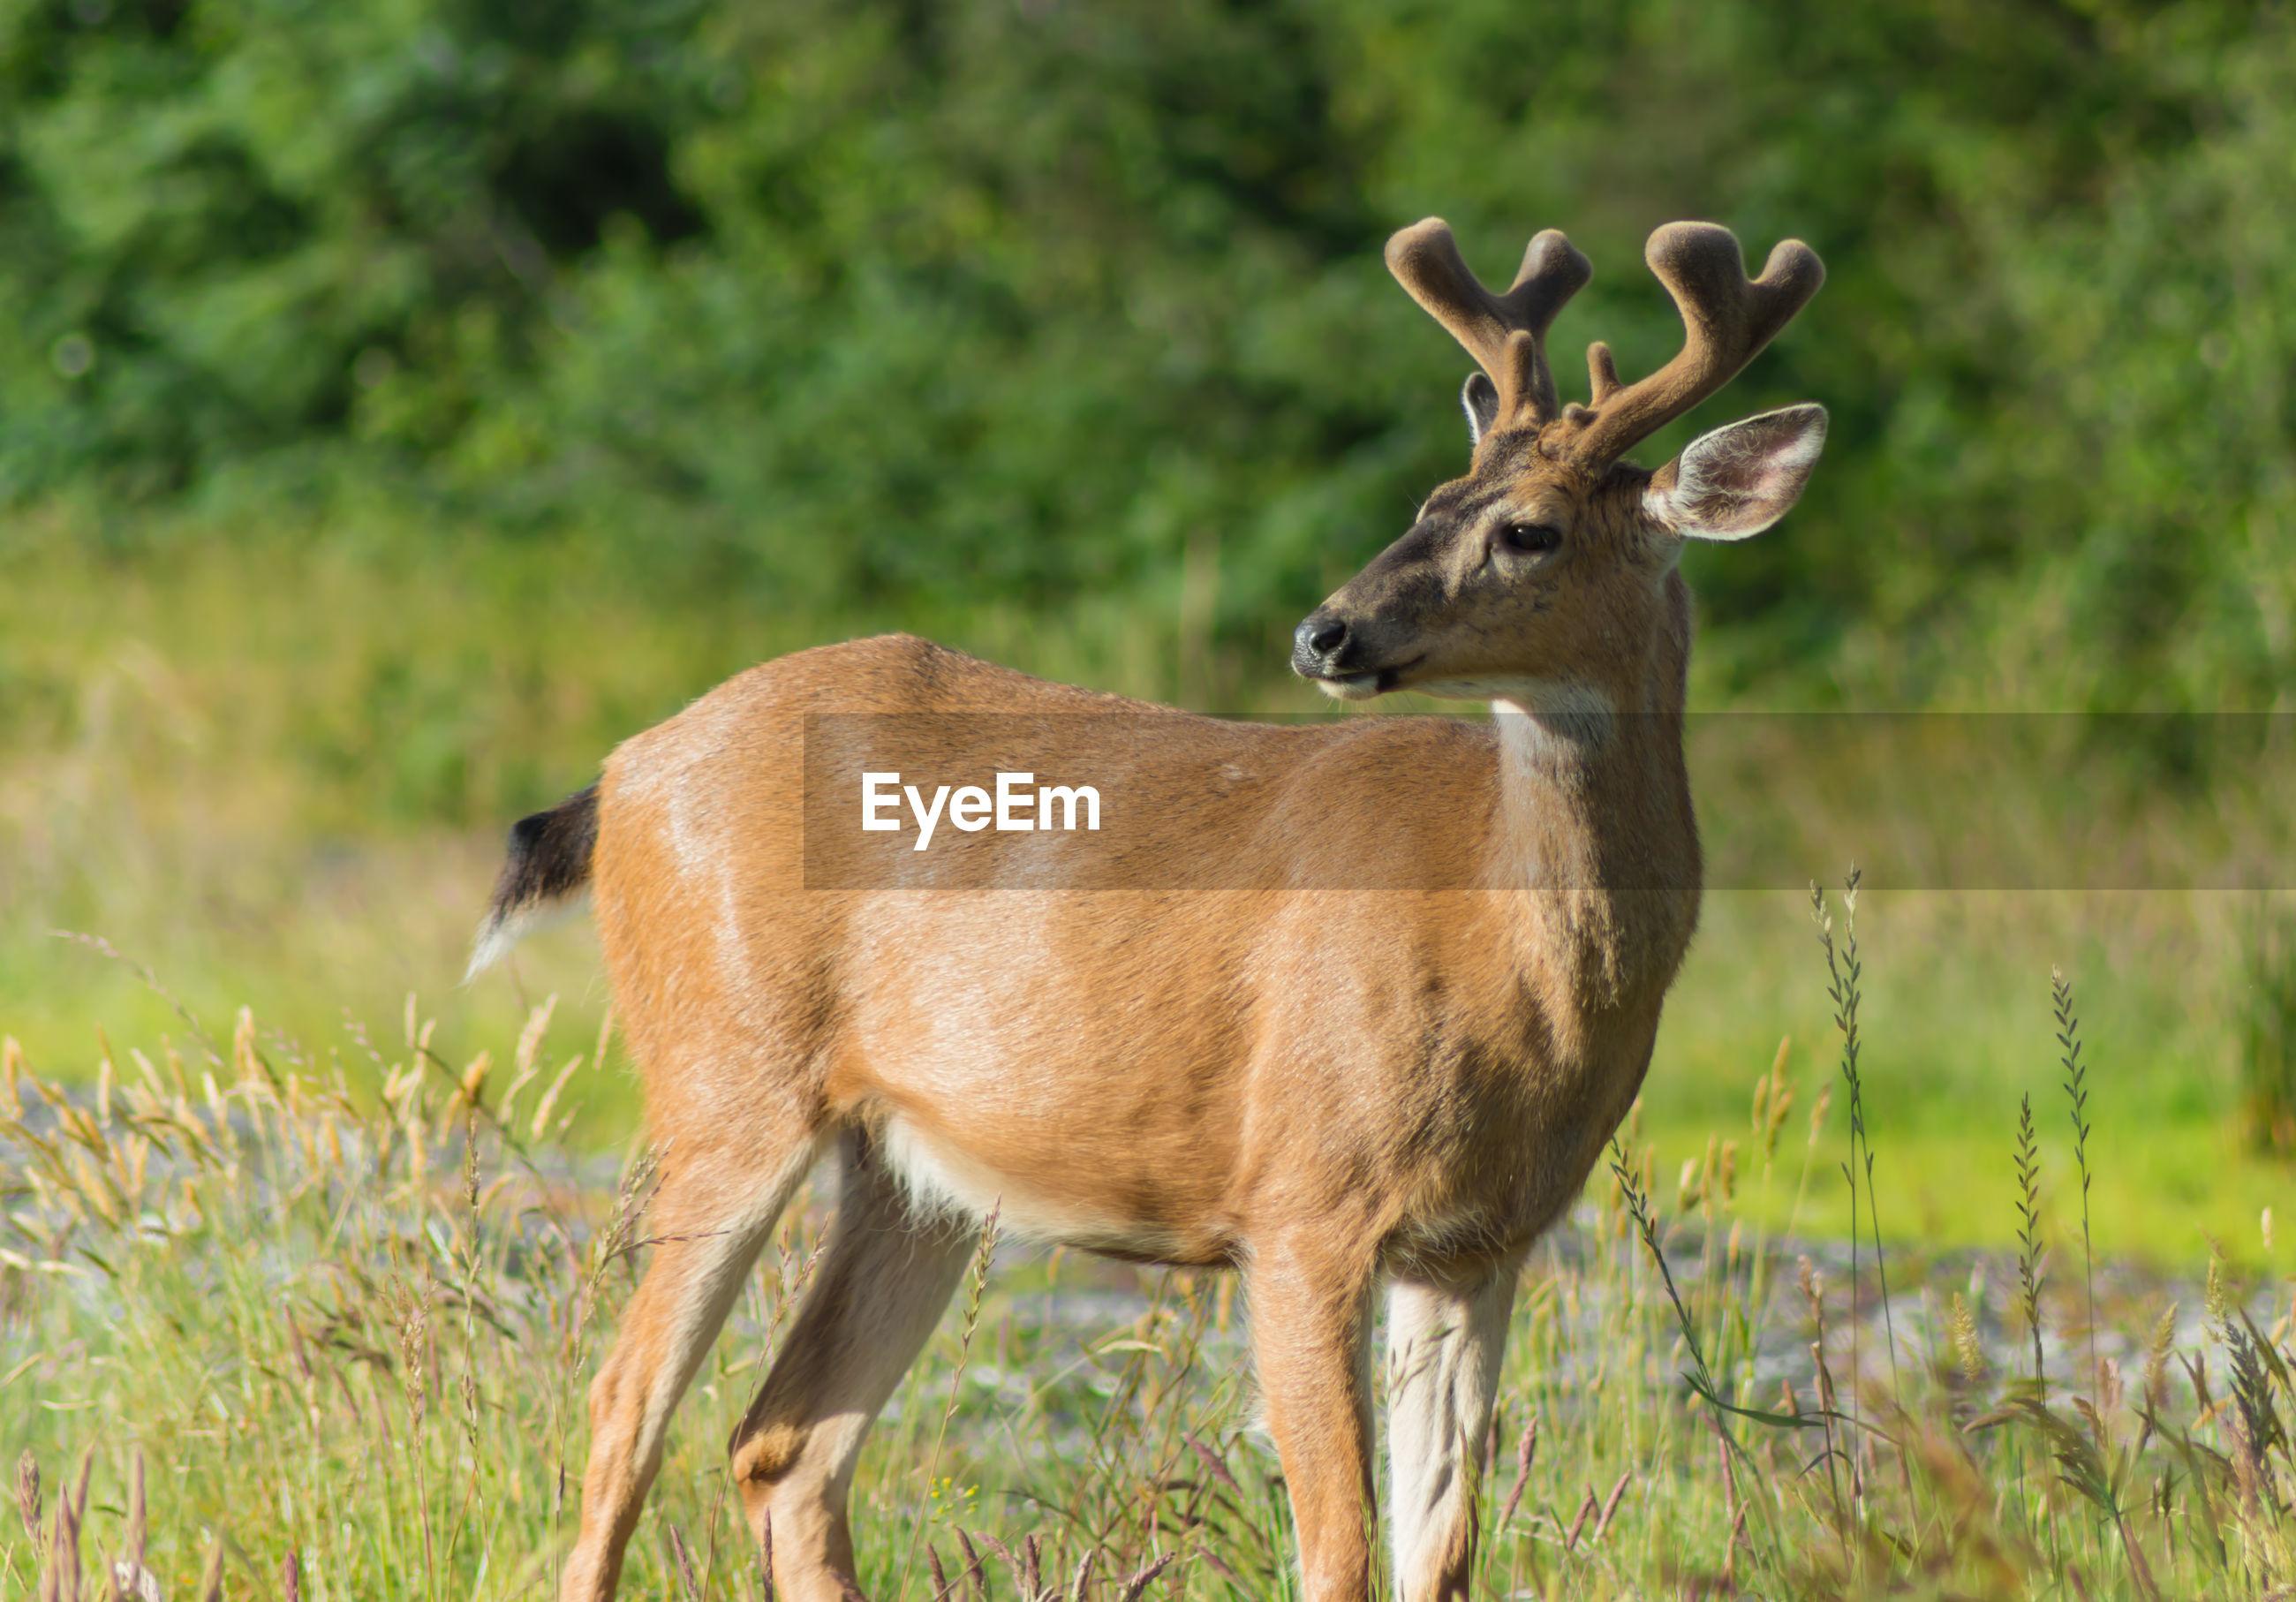 Deer on grassy field